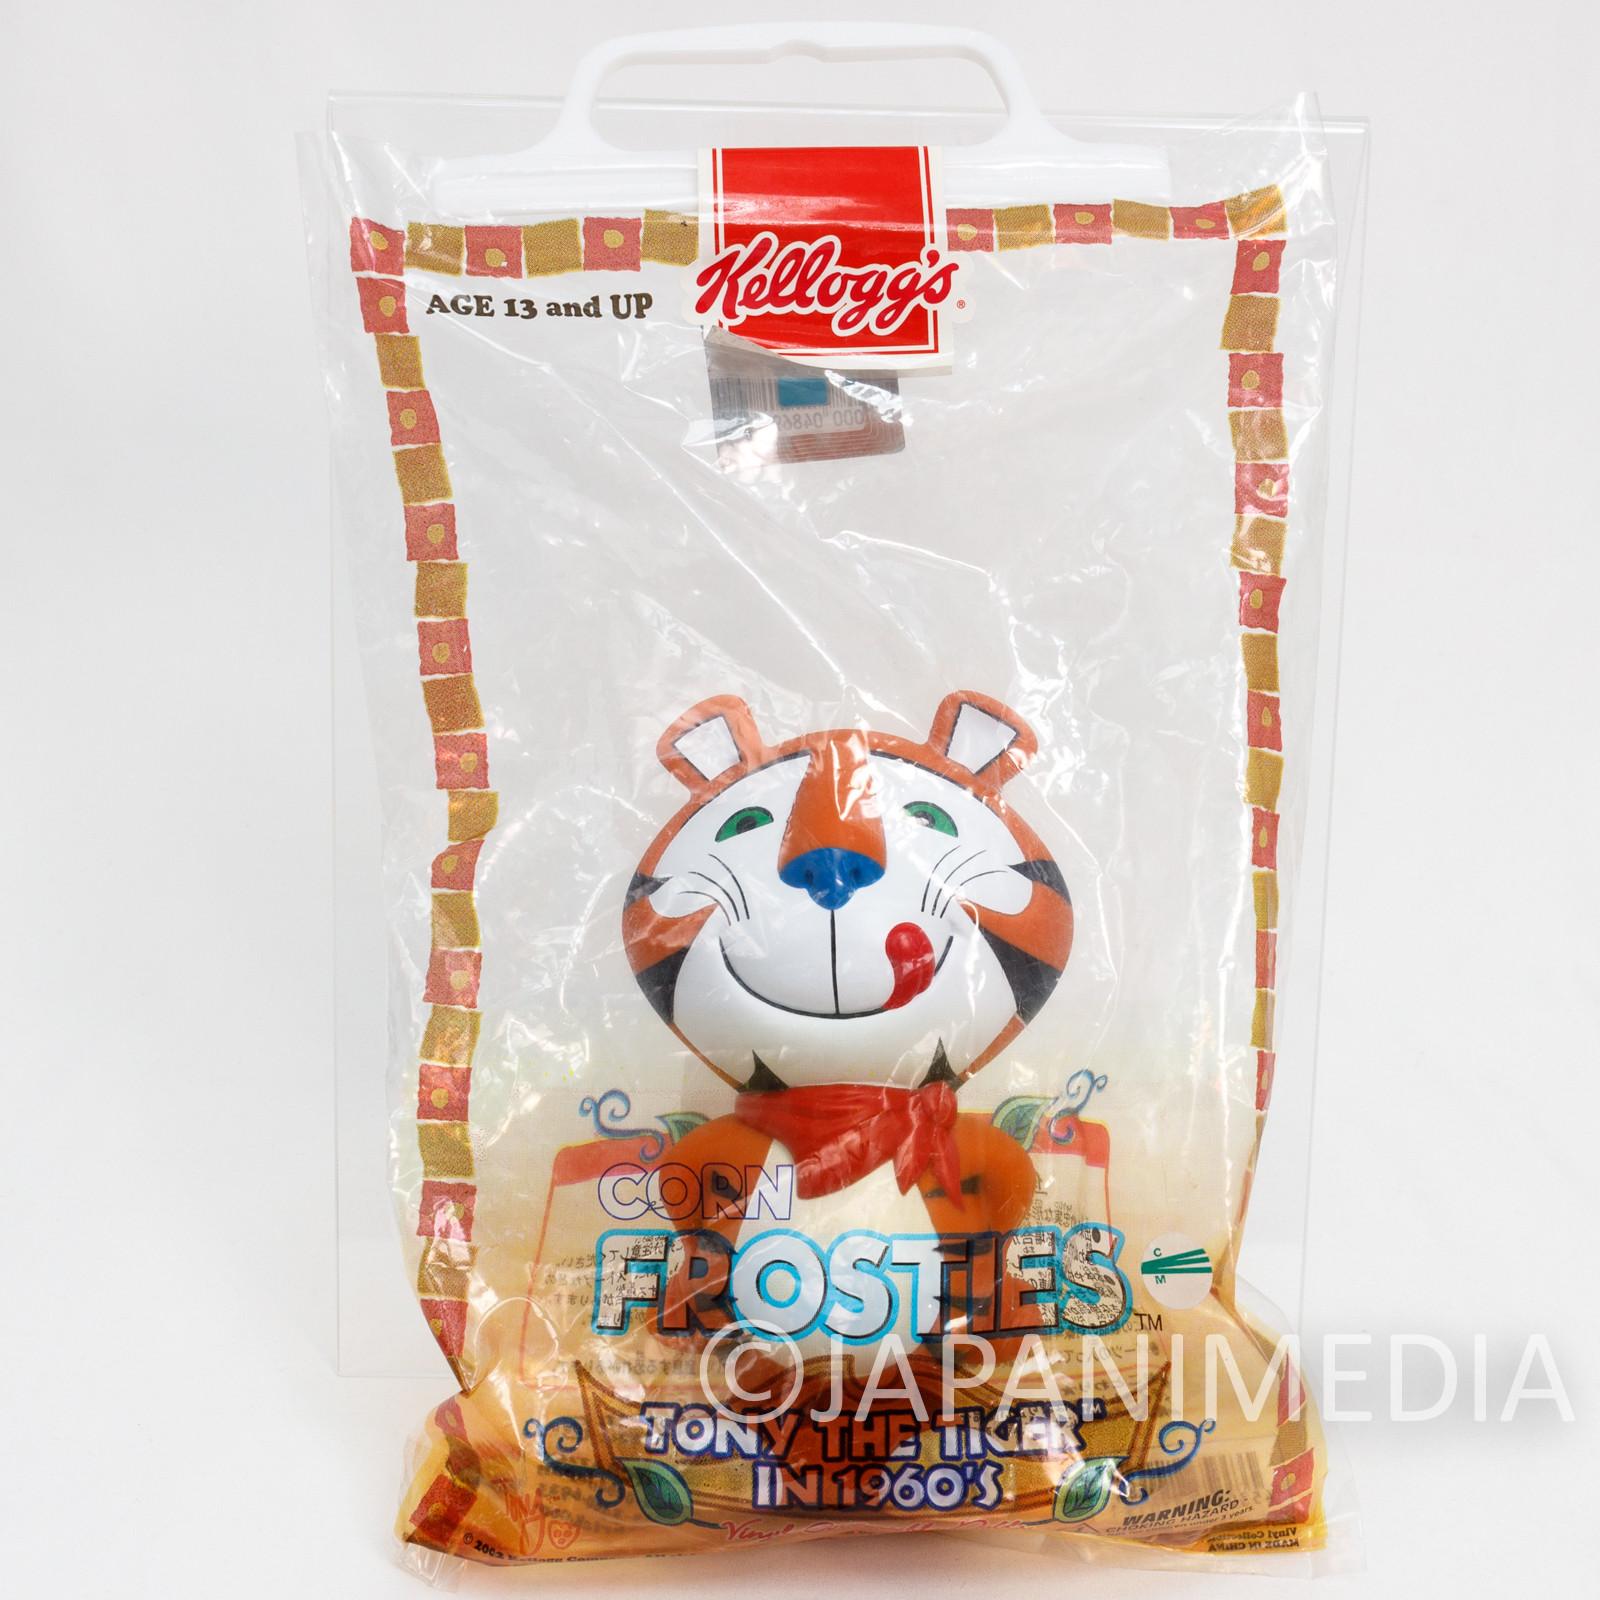 Tony the Tiger Kellogg's Corn Frosties Soft Vinyl Figure VCD Medicom Toy JAPAN